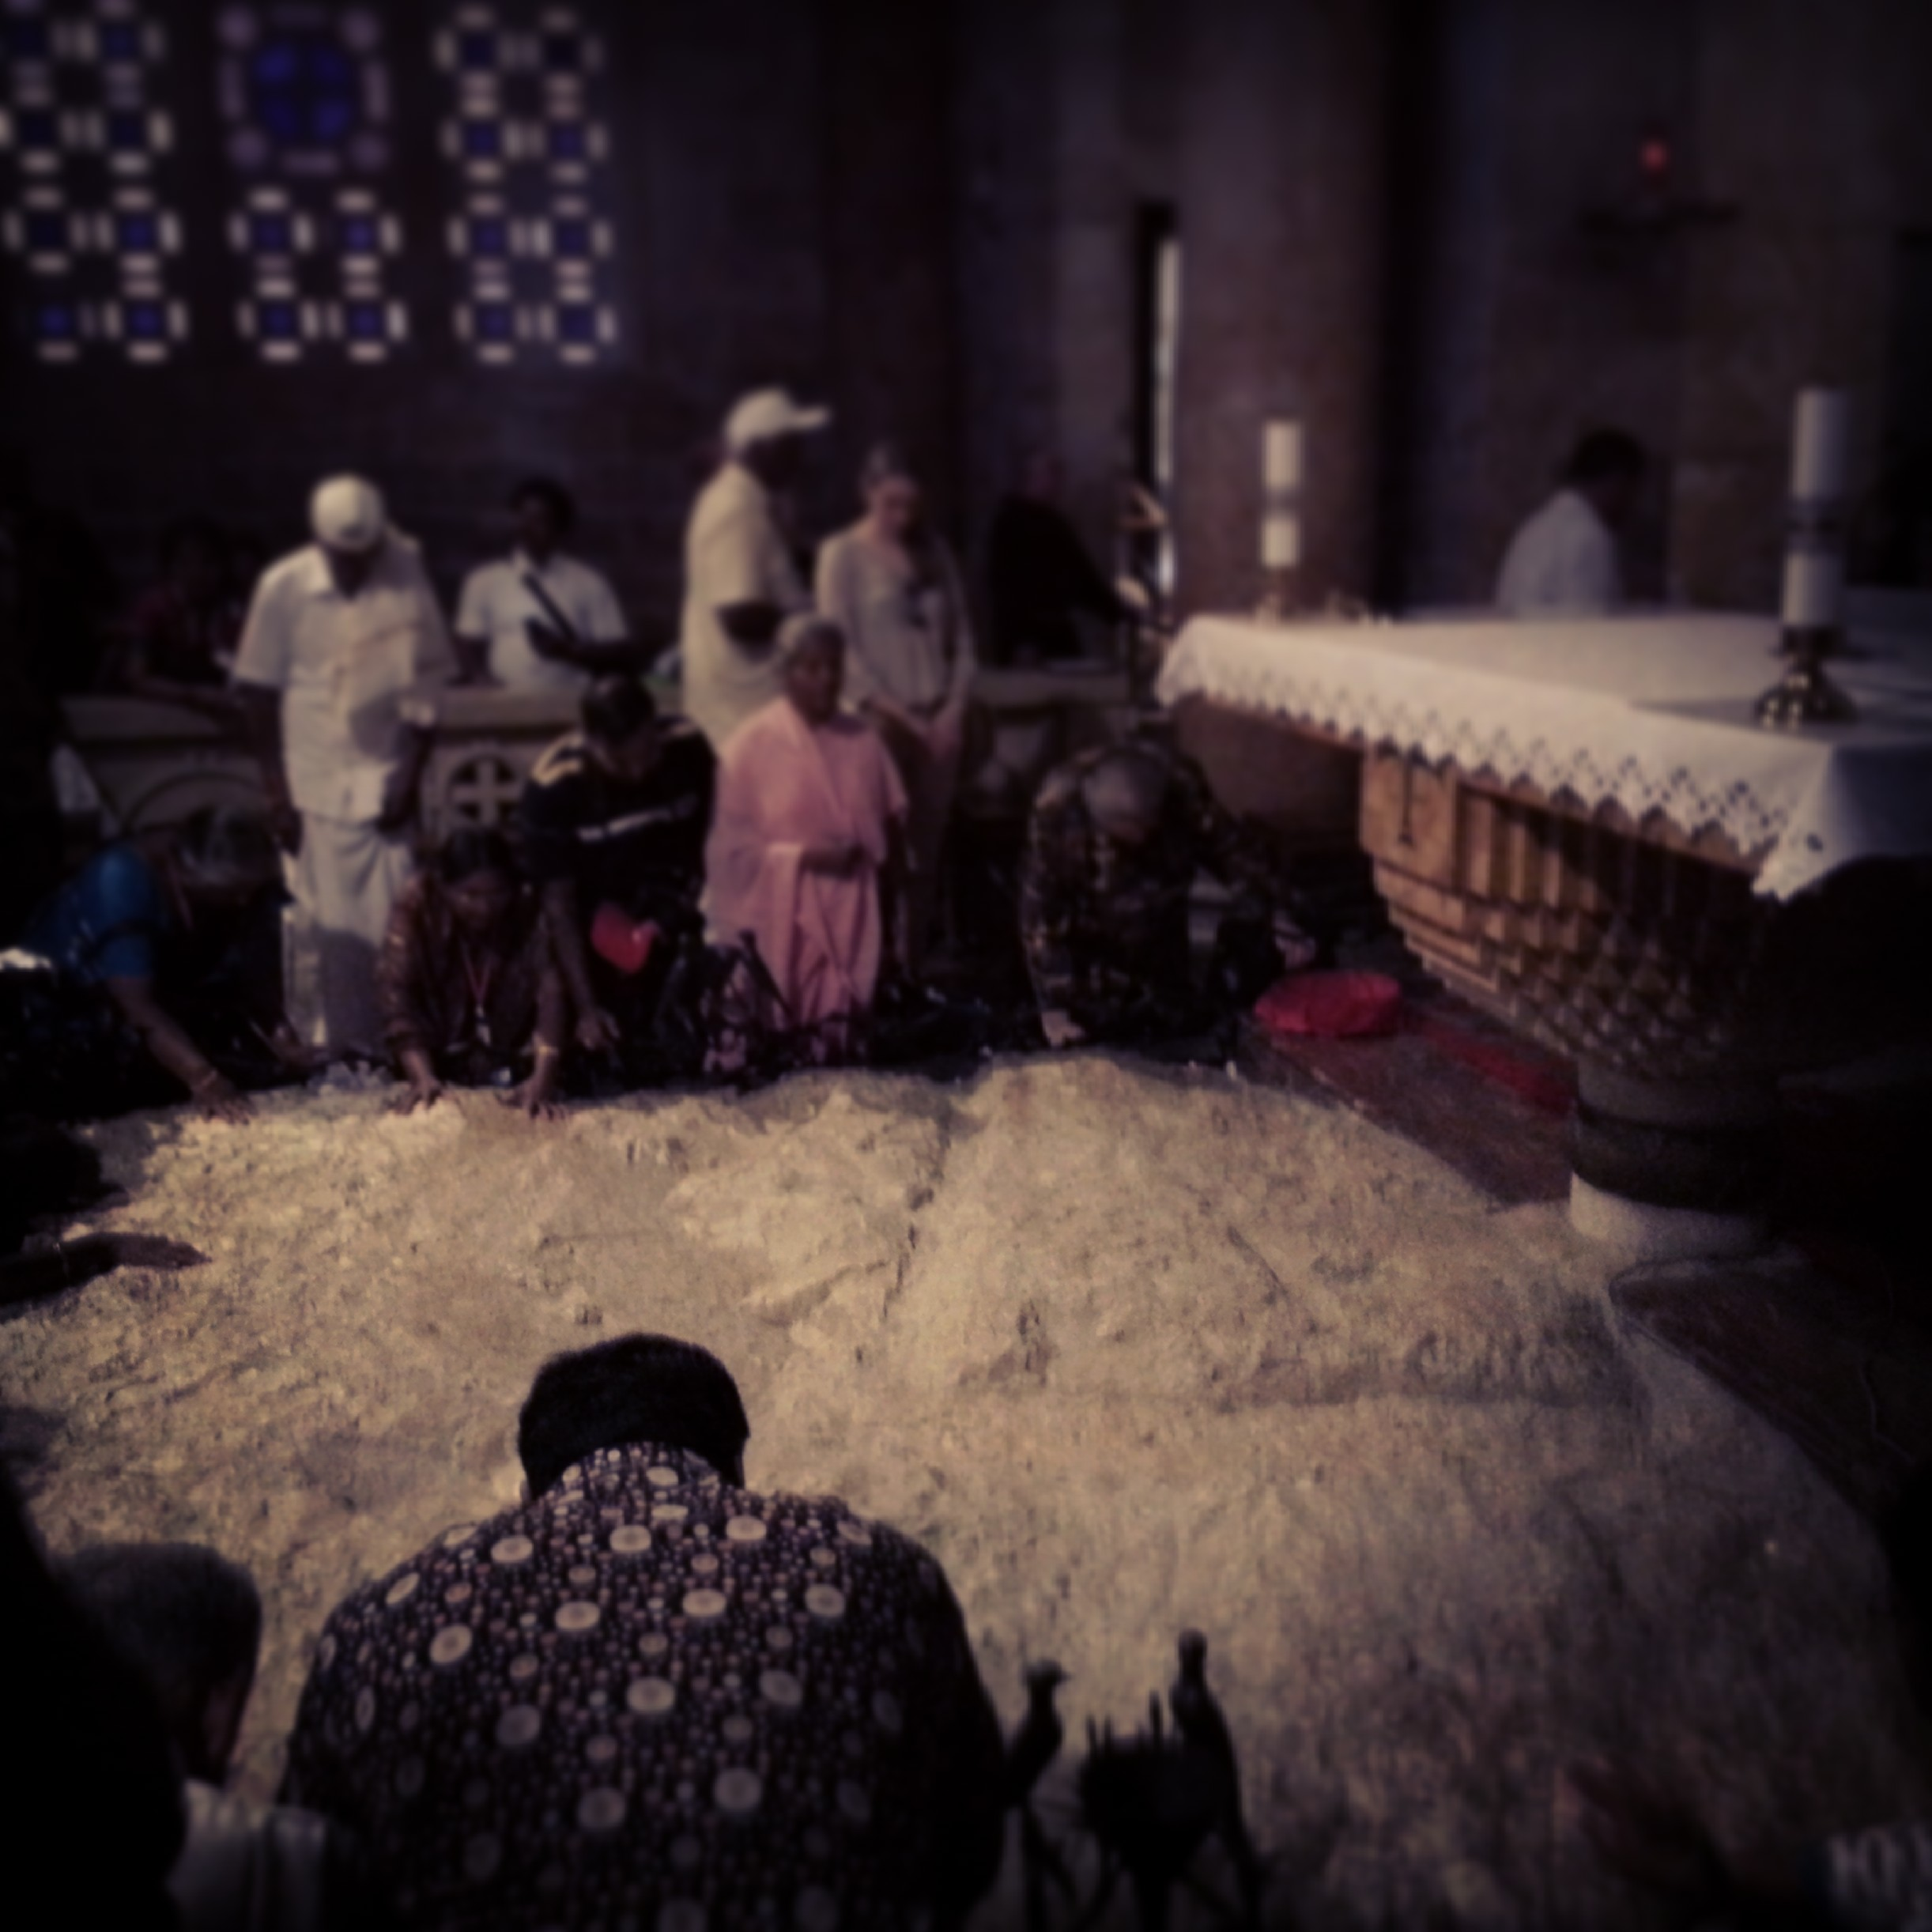 Inside the Church of Gethsemane in Jerusalem